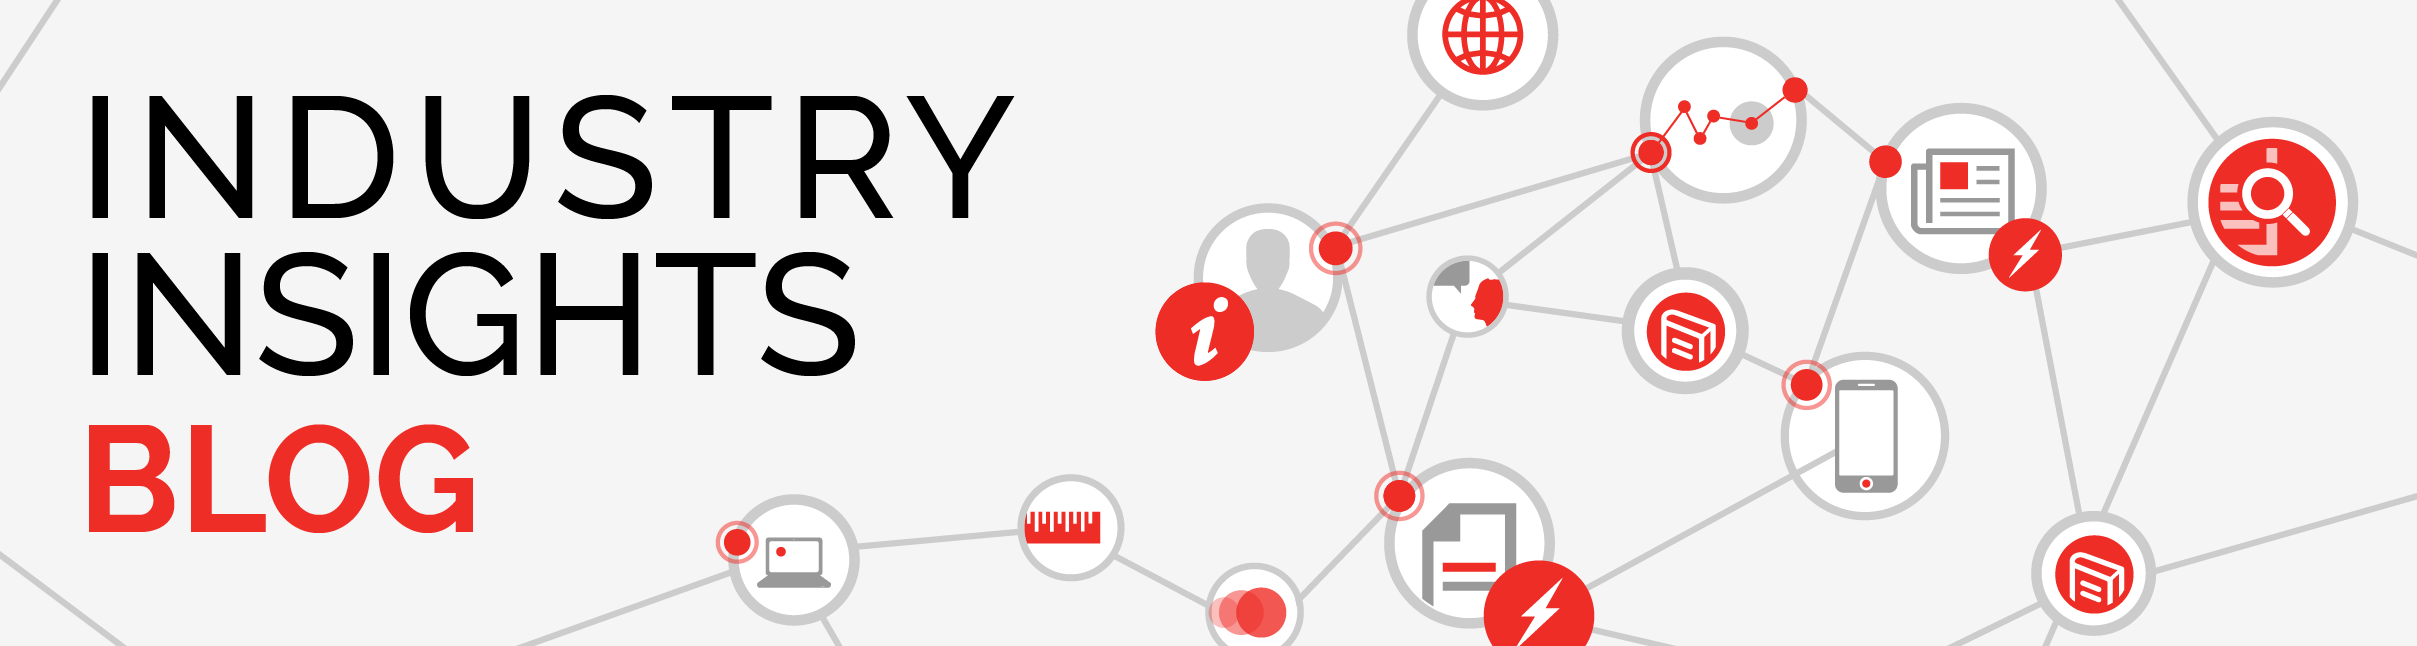 Industry Insights Blog